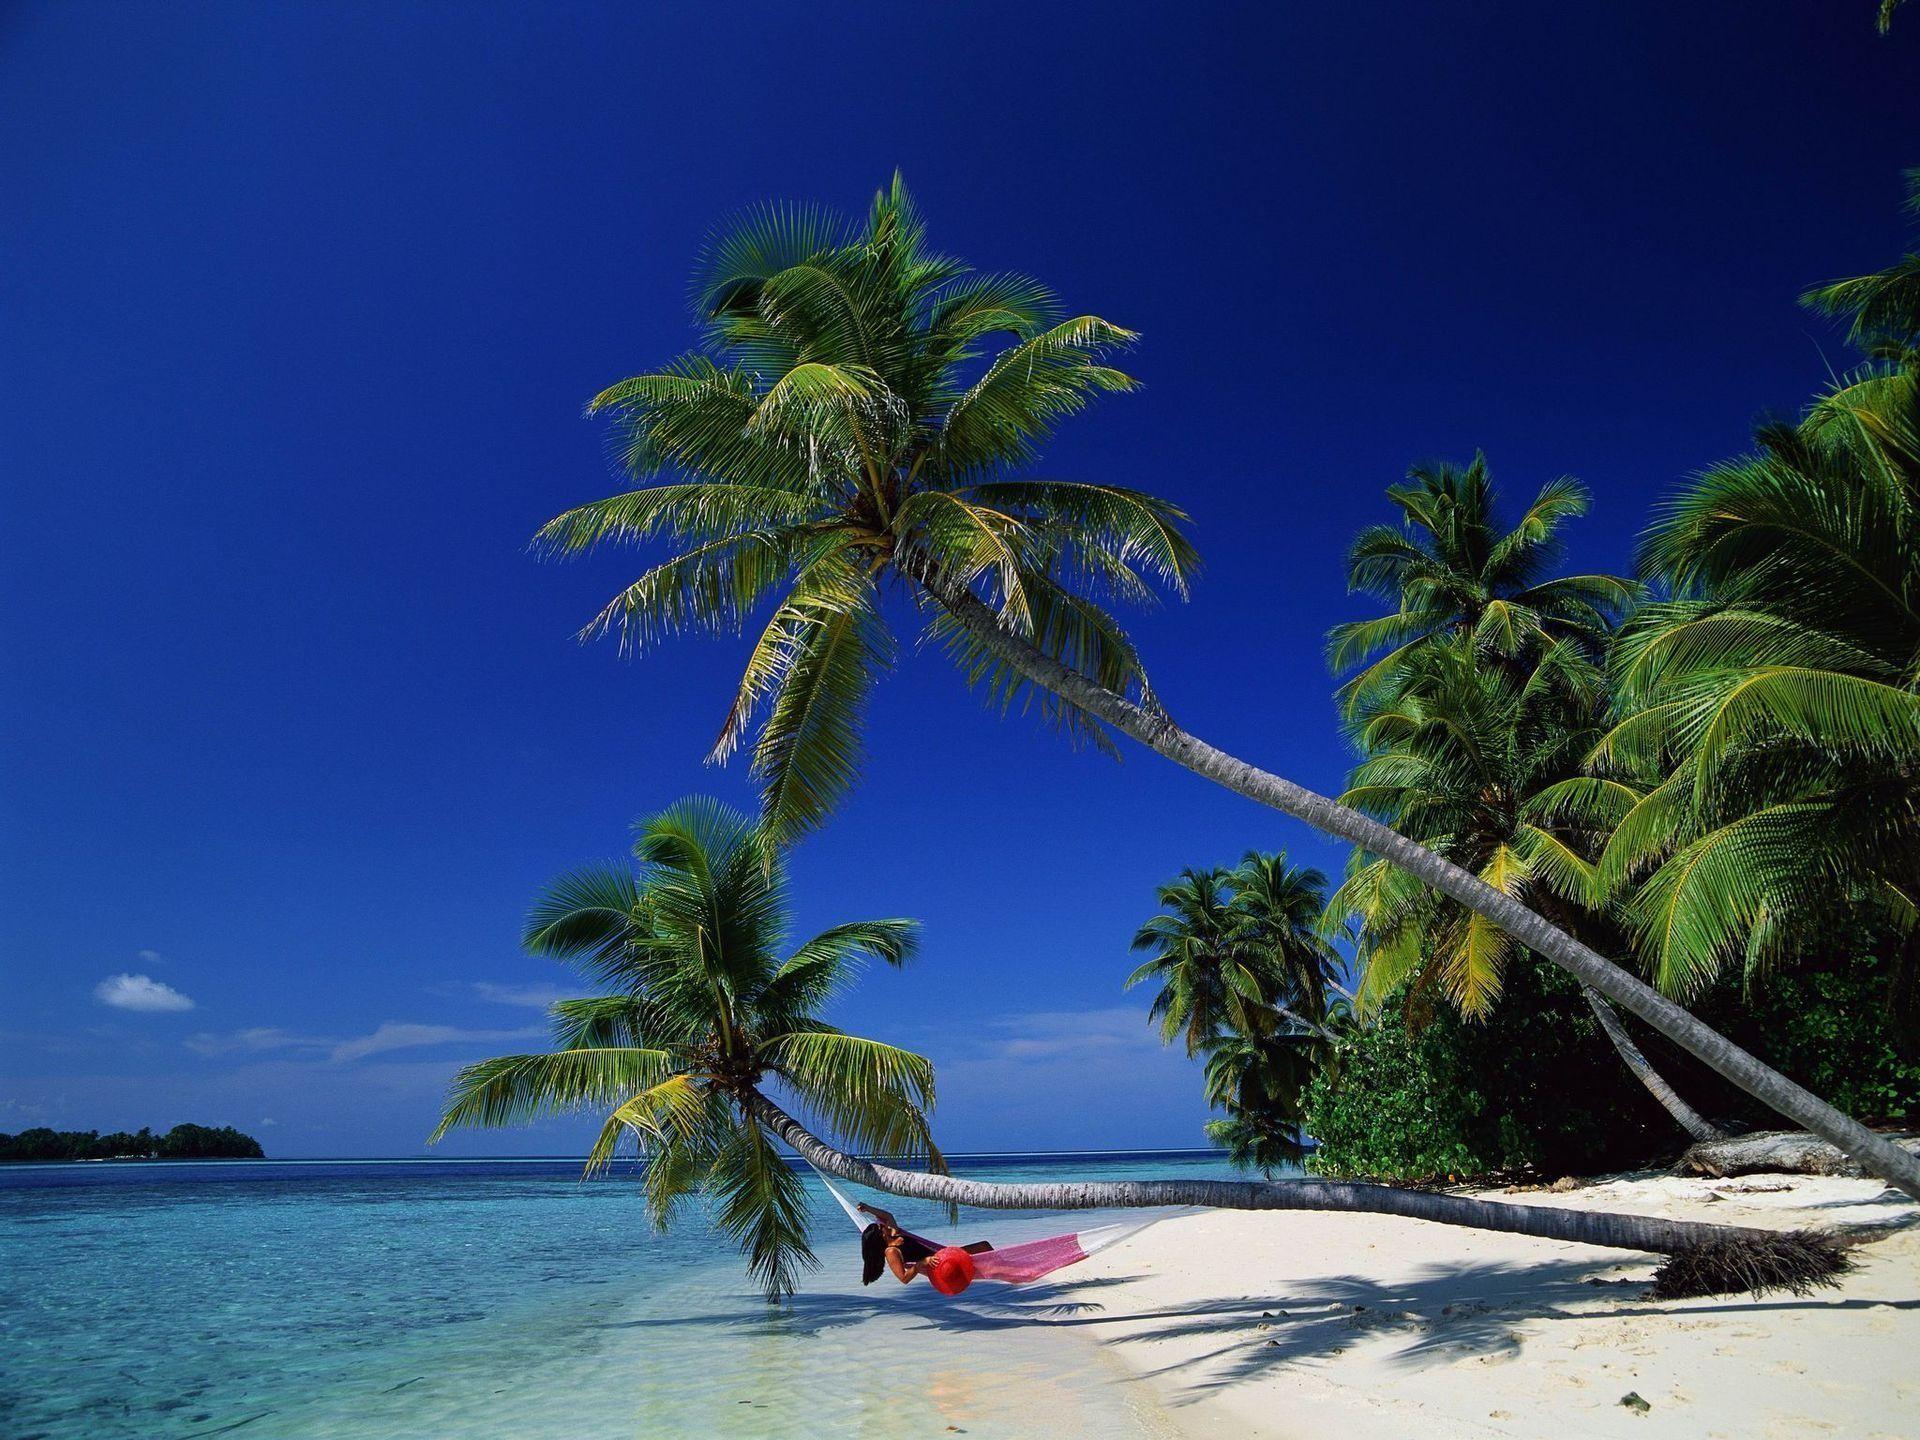 Paradise Hammock On A Tropical Island Beach With Palm Trees In Tahiti Beach Wallpaper Beach Hammock Tropical Island Beach Tropical island beach palm sea sand